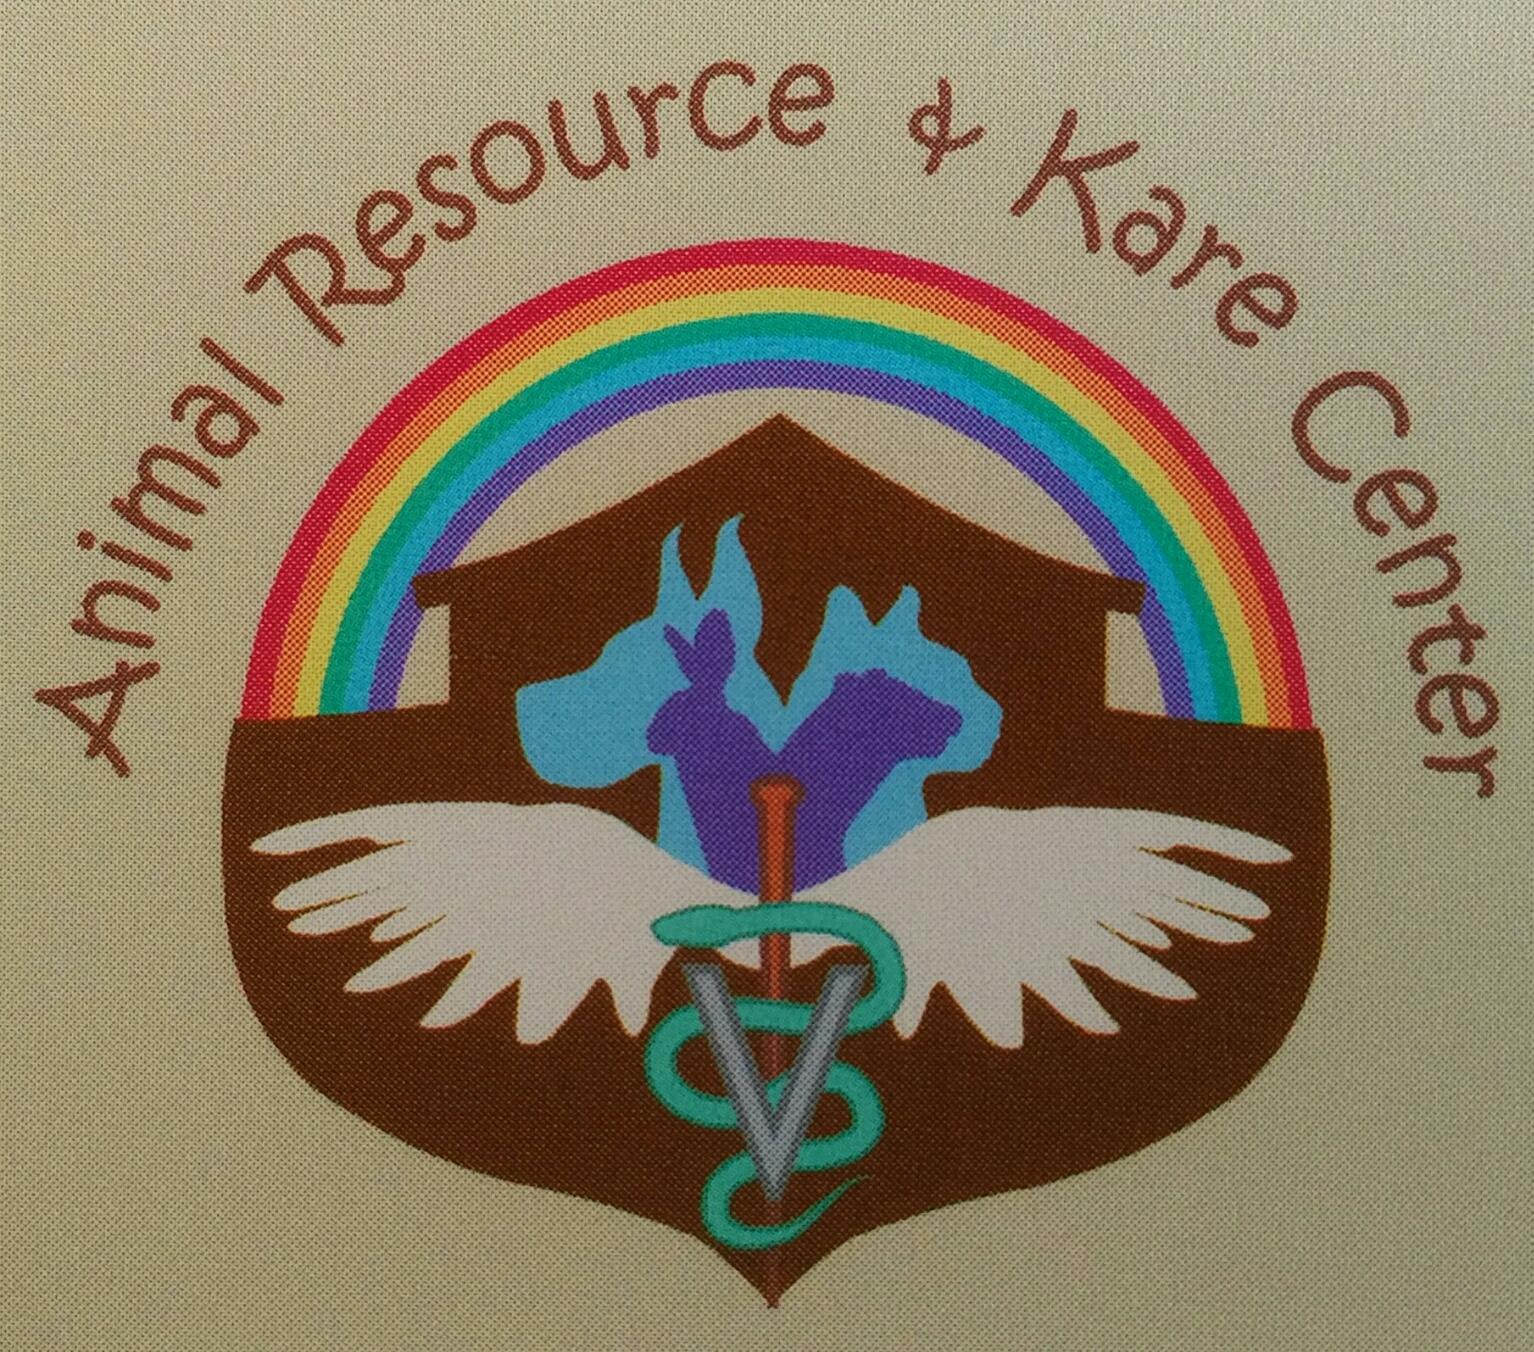 Animal Resource and Kare Center (My ARK Center)